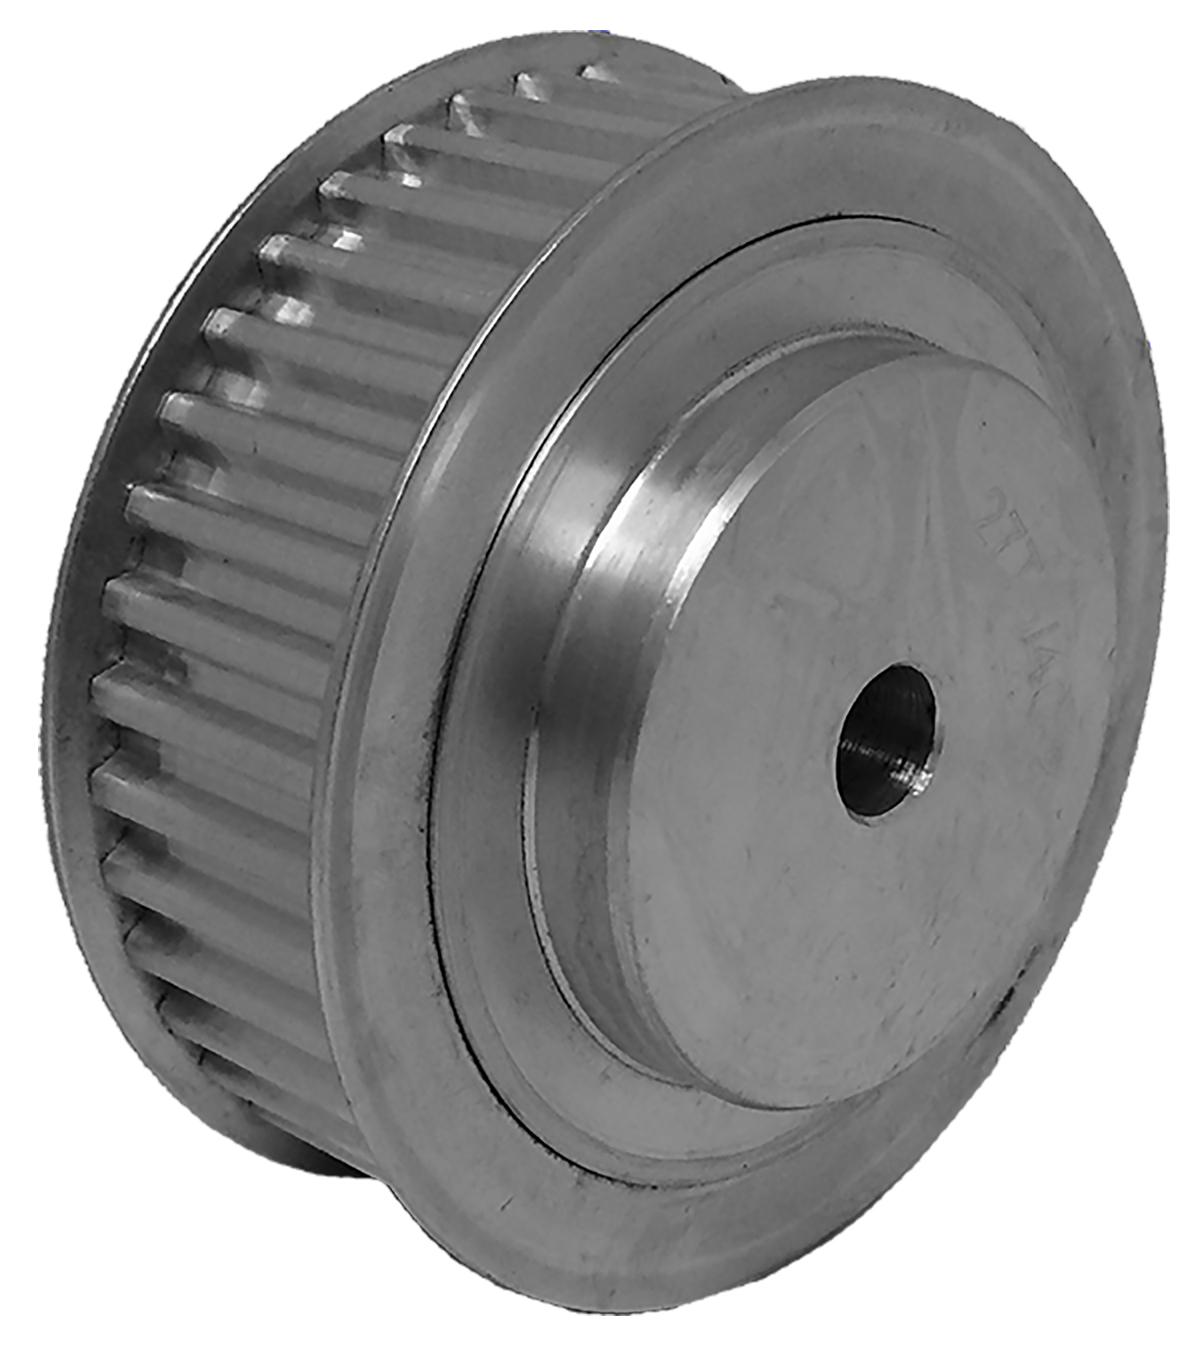 27T5/40-2 - Aluminum Metric Pulleys